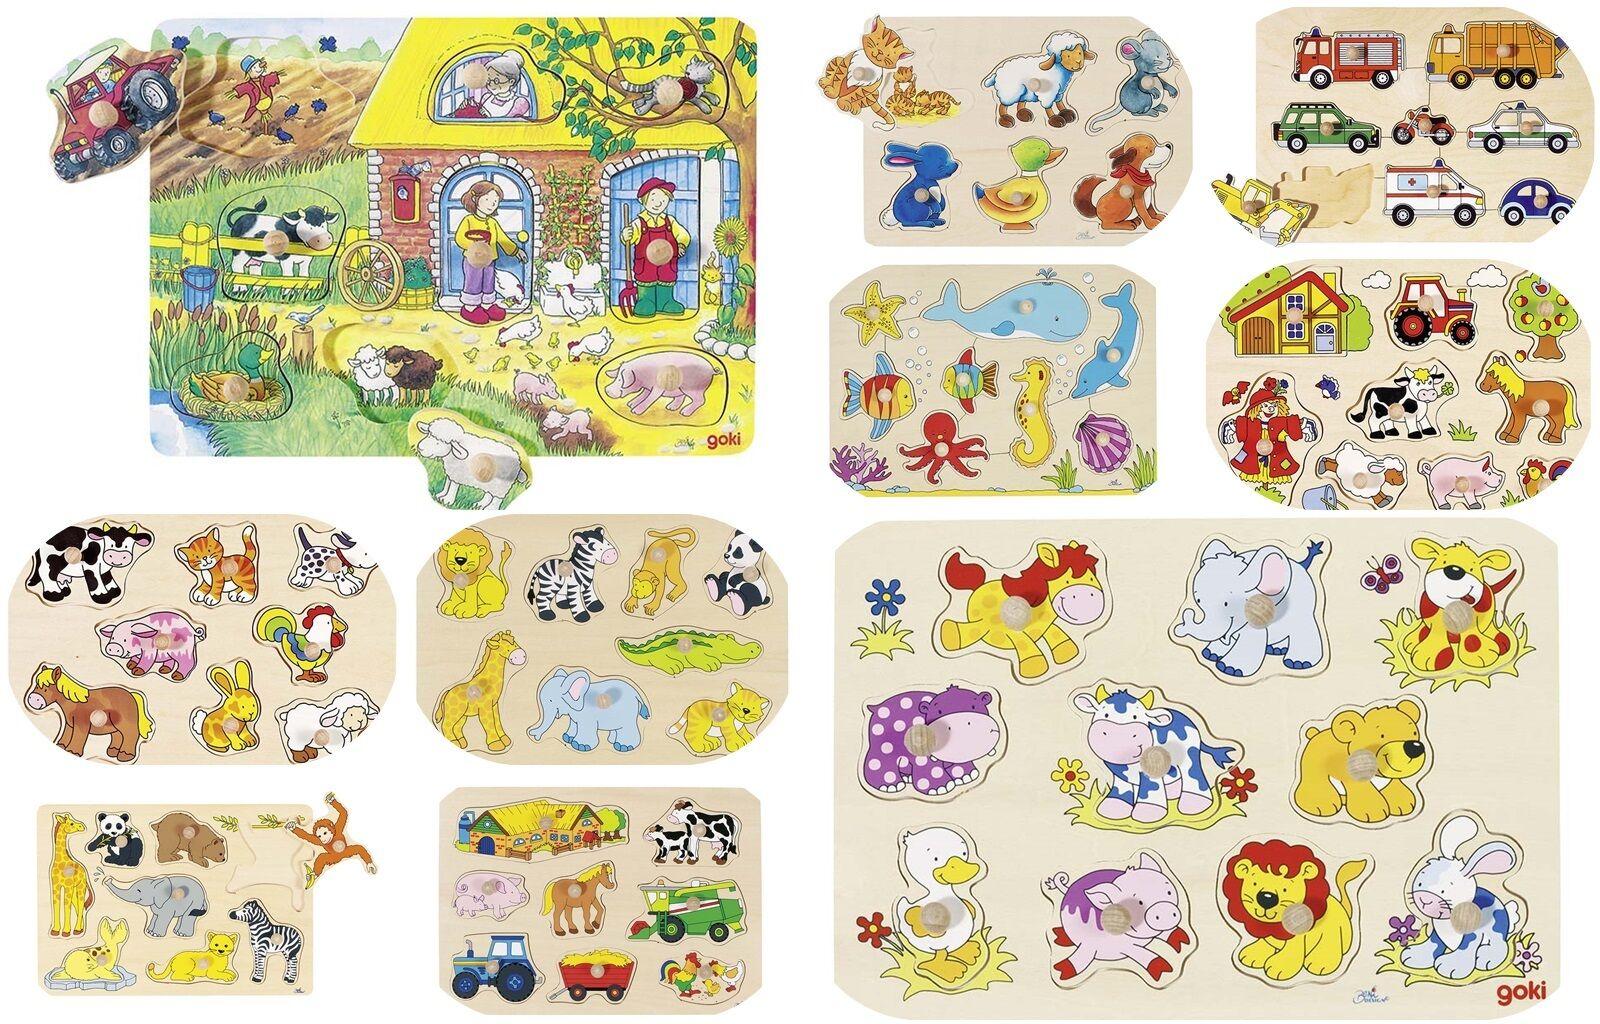 NEU GOKI Steckpuzzle Hintergrundbildpuzzle Puzzle 30 x 21 cm 4 Motive OVP